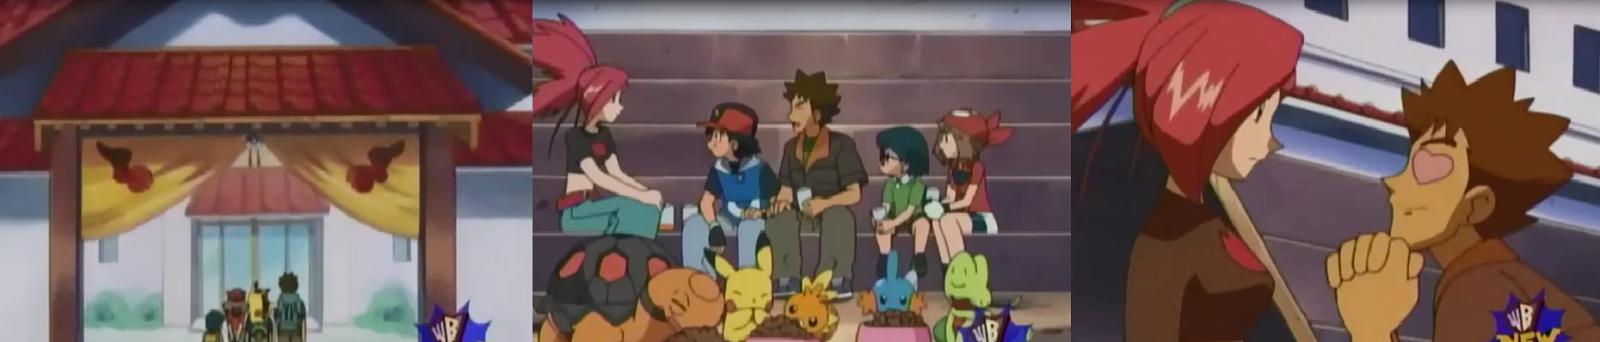 Pokemon Capitulo 15 Temporada 7 Problemas Poéticos